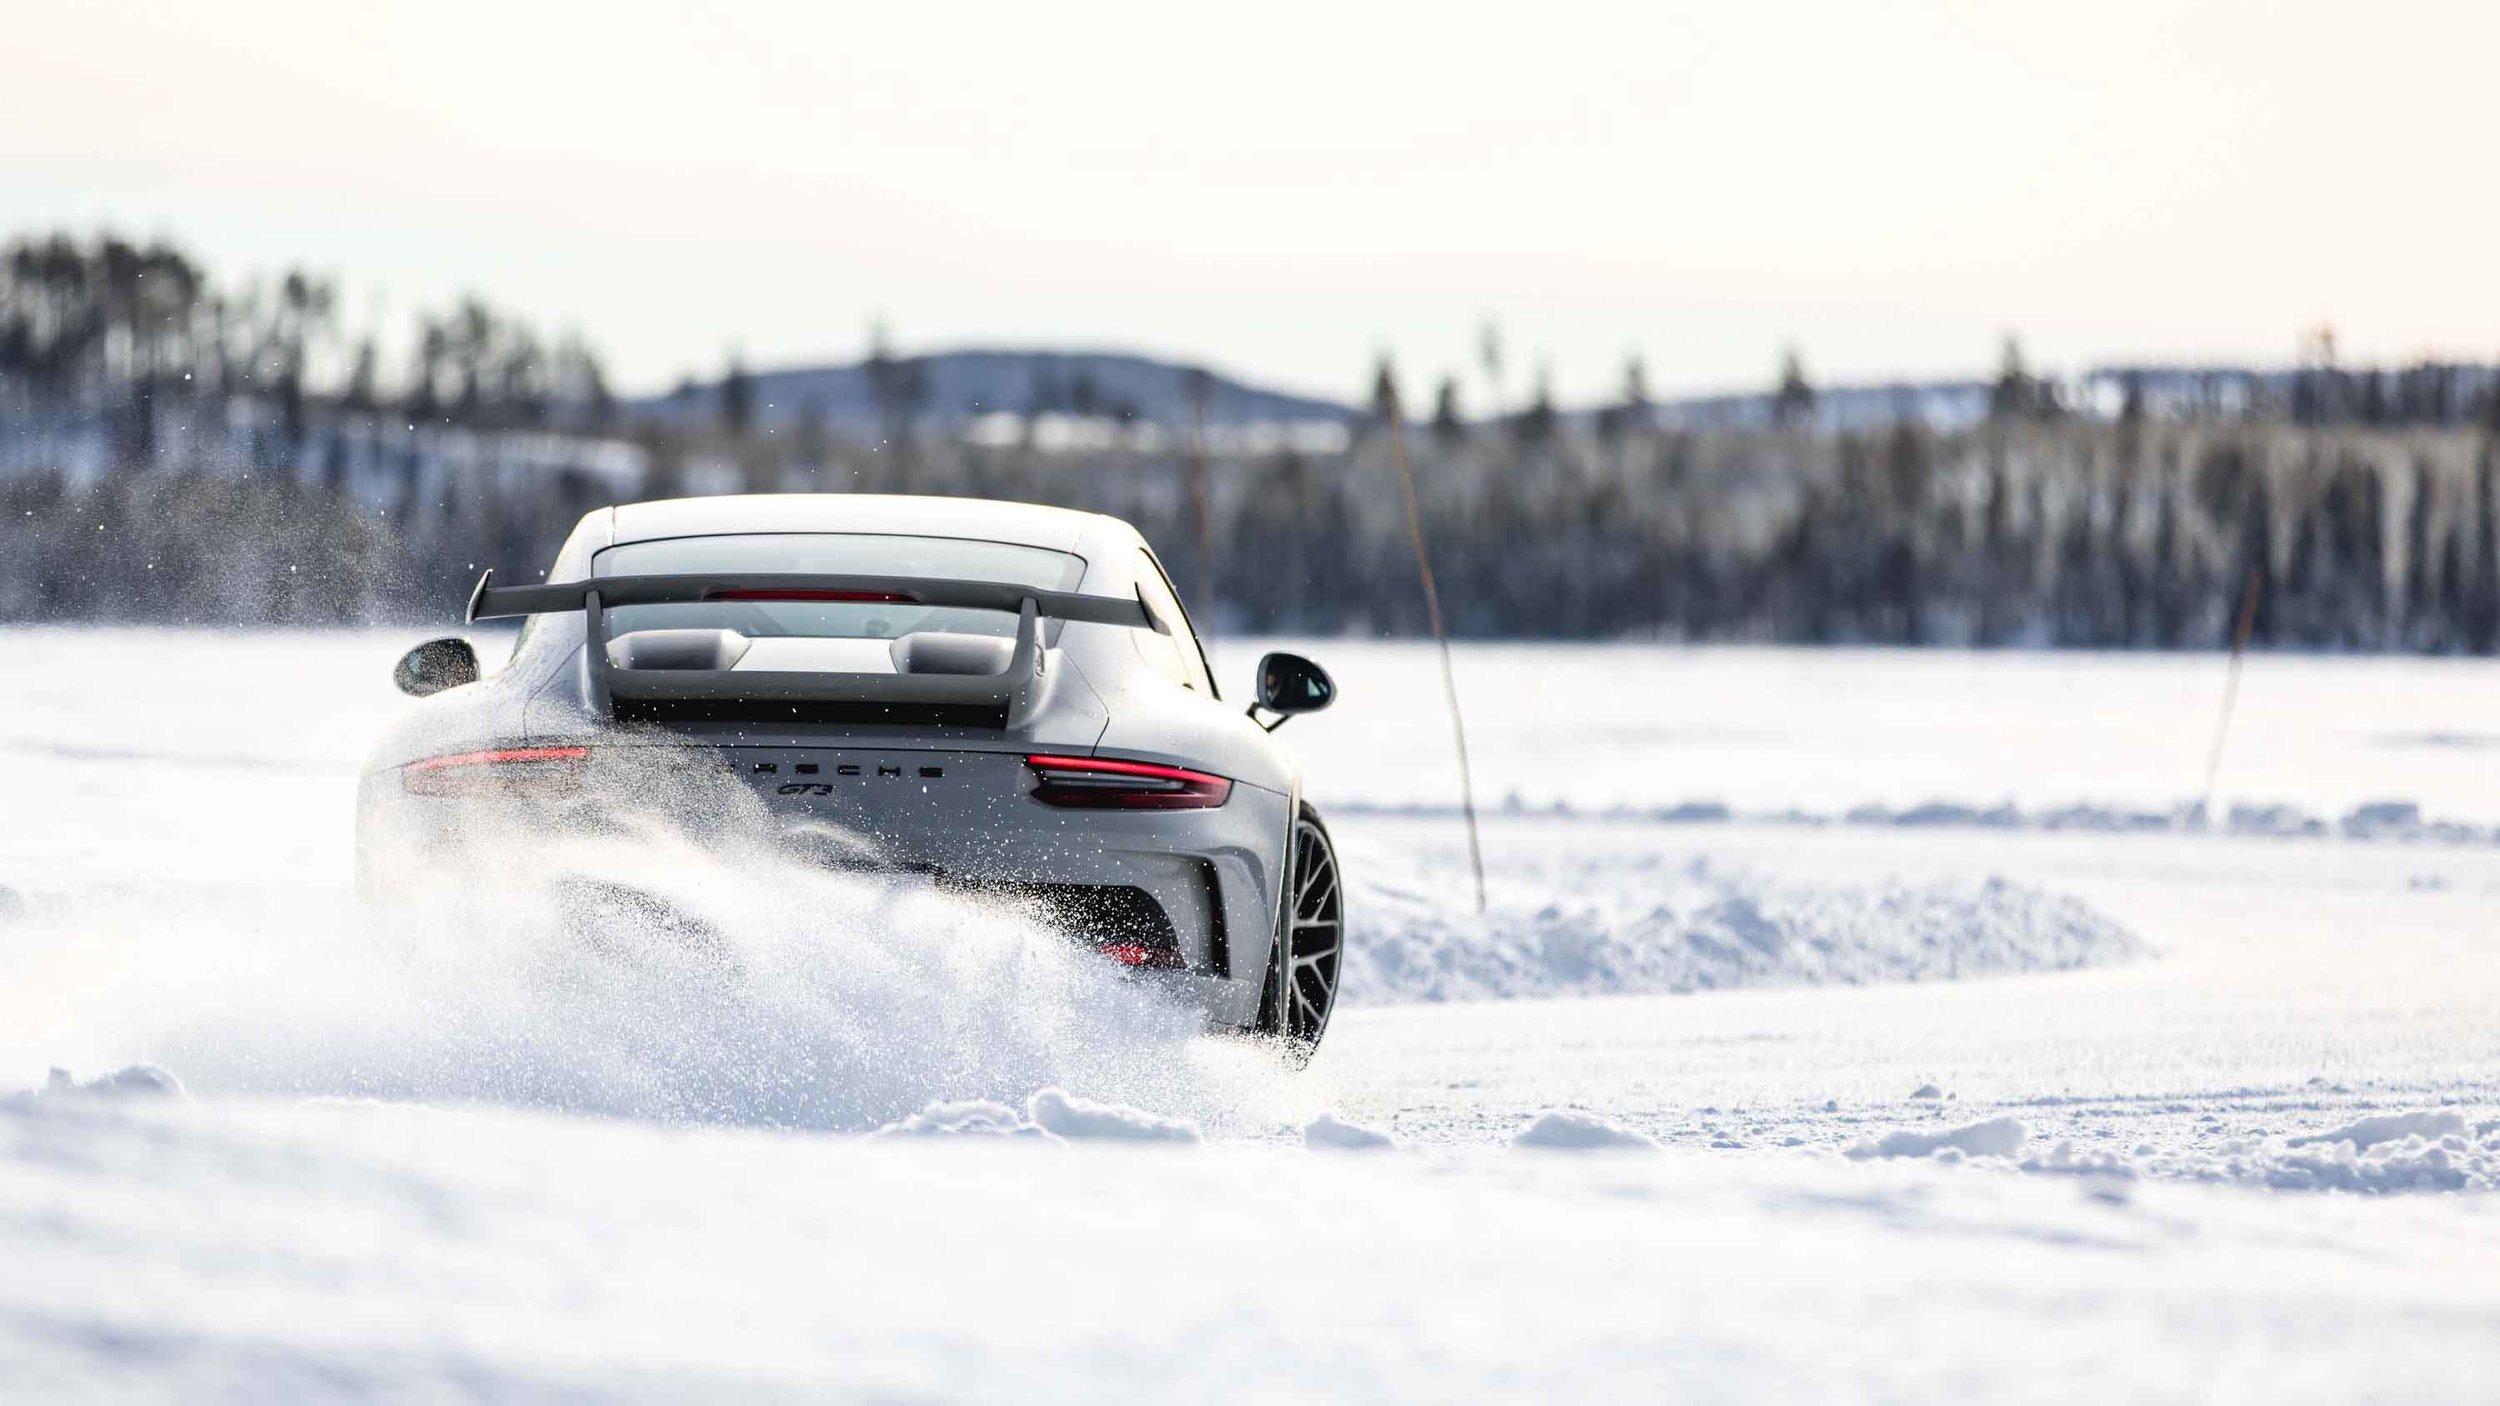 Lake Lappland - Fotografie